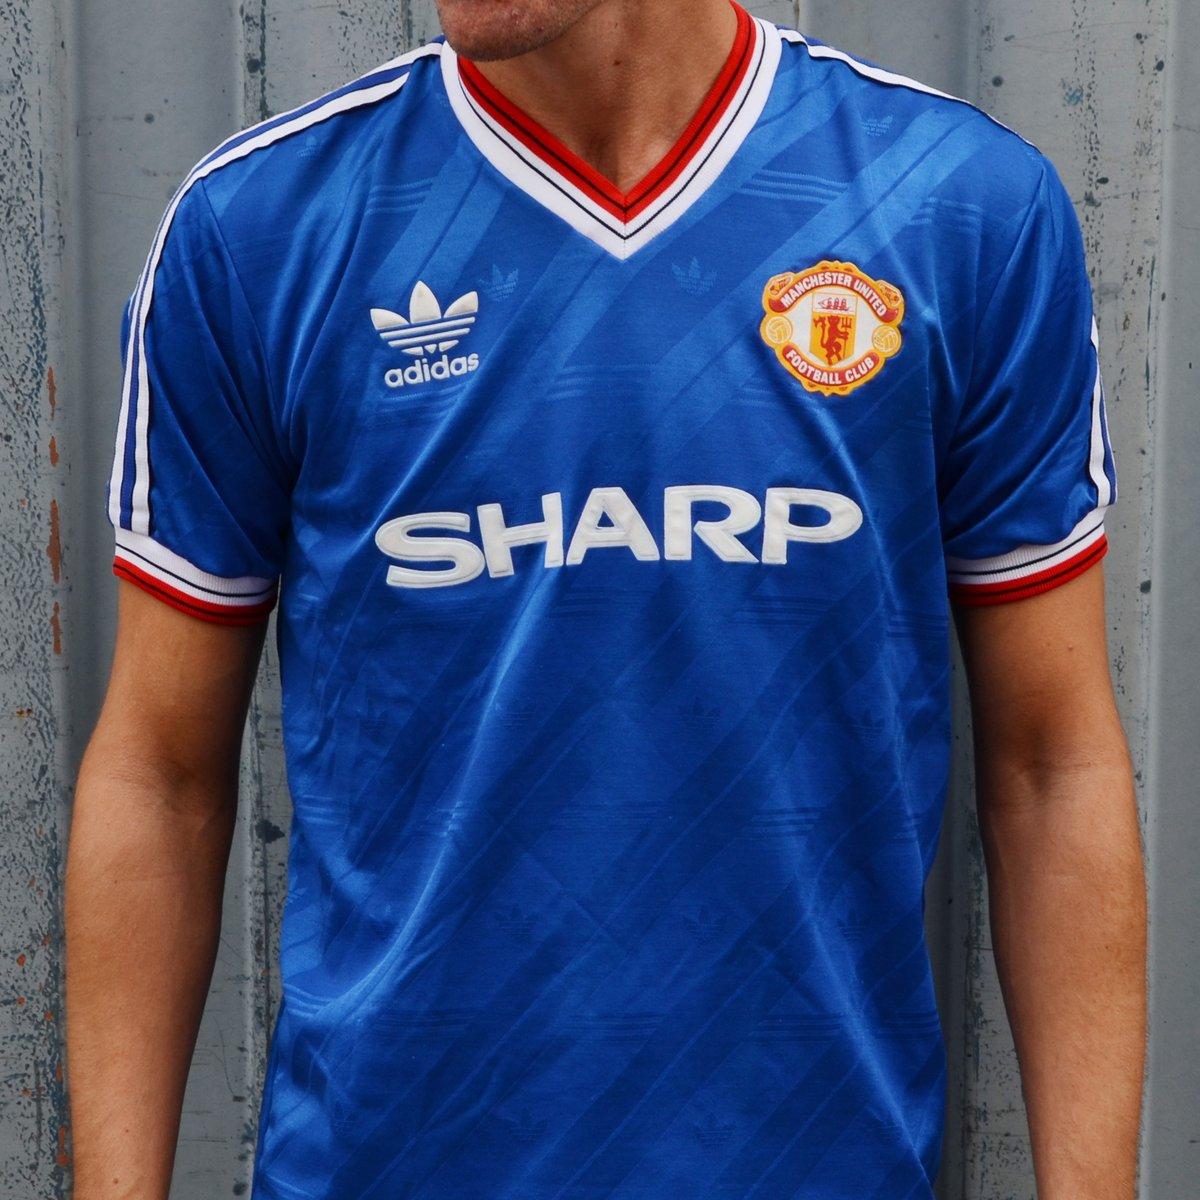 hot sales c5b92 79fd2 Classic Football Shirts on Twitter: